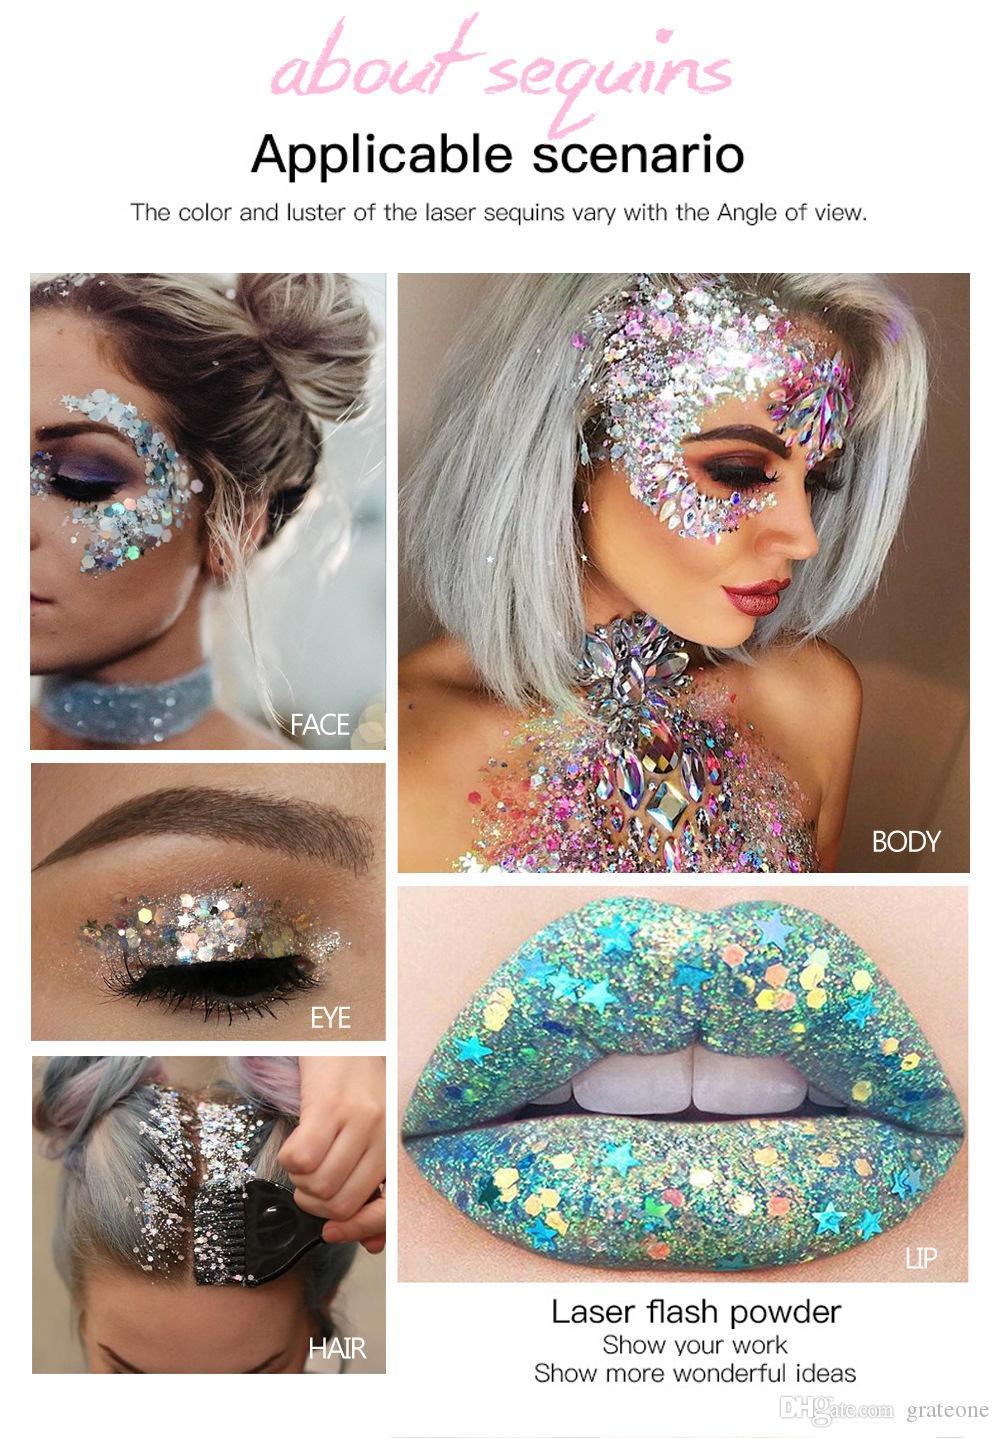 DHL free HANDAIYAN BRONZERS Holographic Mermaid Glitter Eyeshadow Gel Body Face Eye Liquid Loose Sequins Pigments Makeup Cream Festival Gems